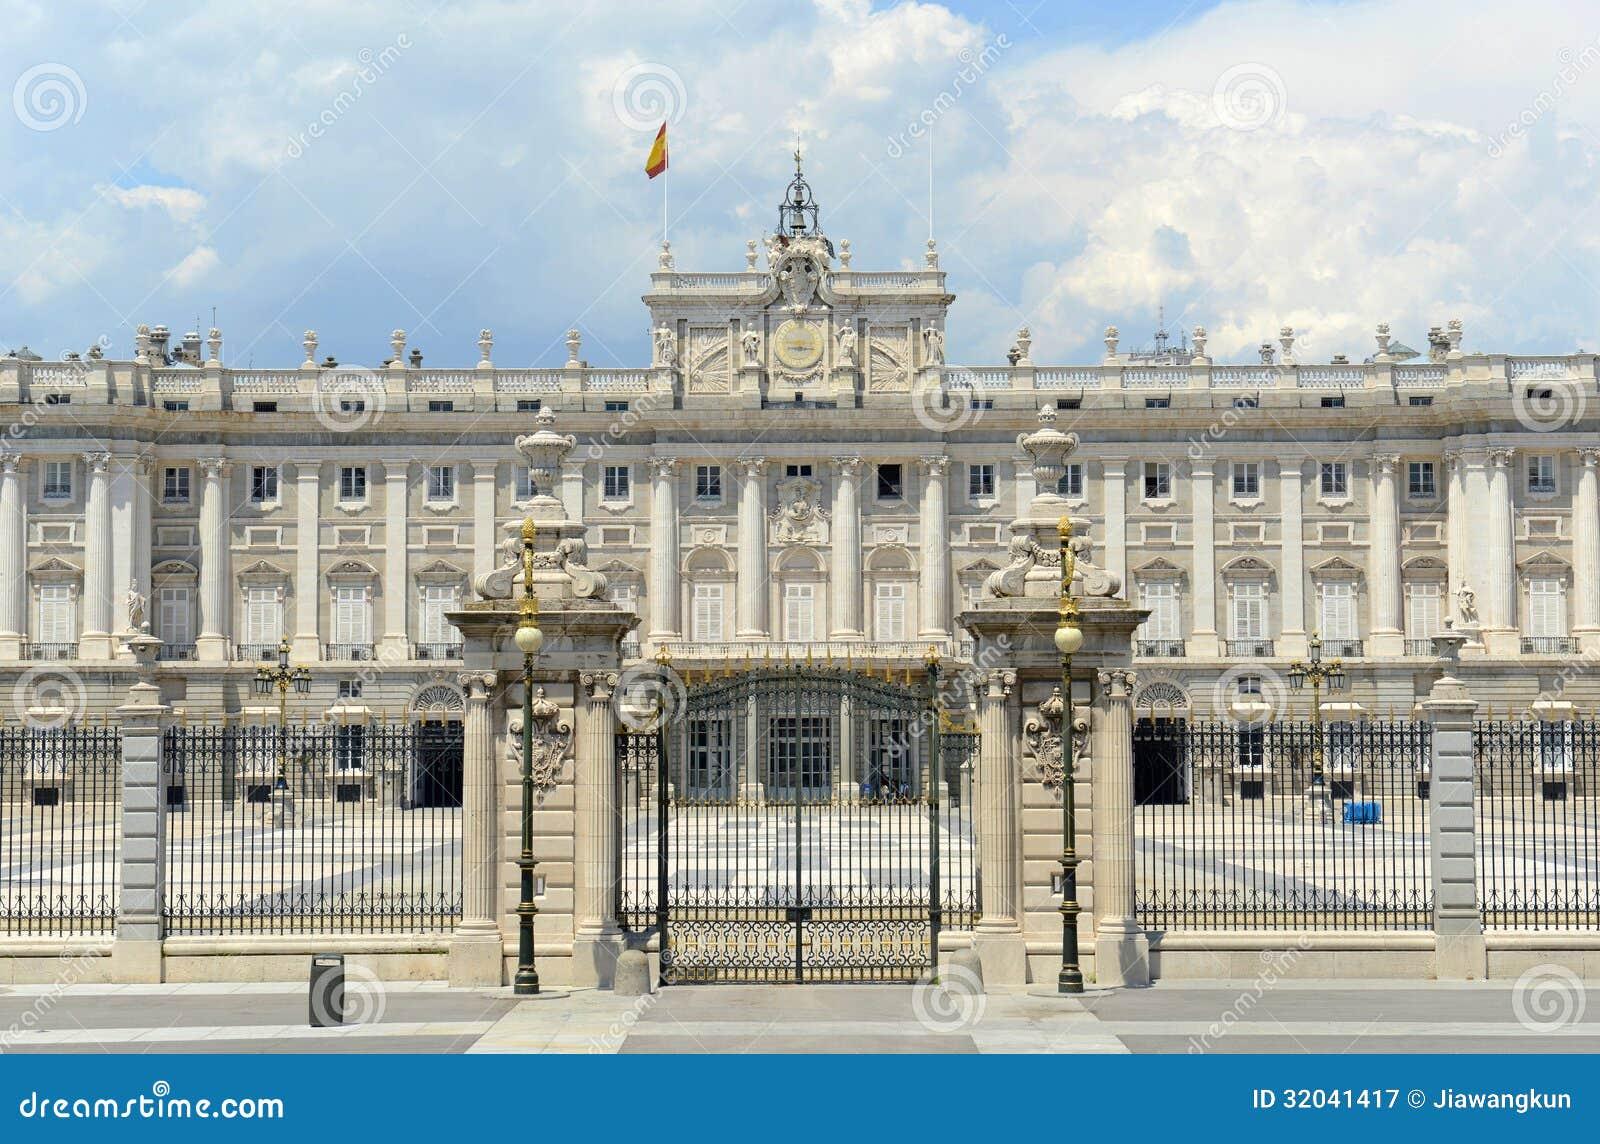 royal palace of madrid spain stock image image of politics euro